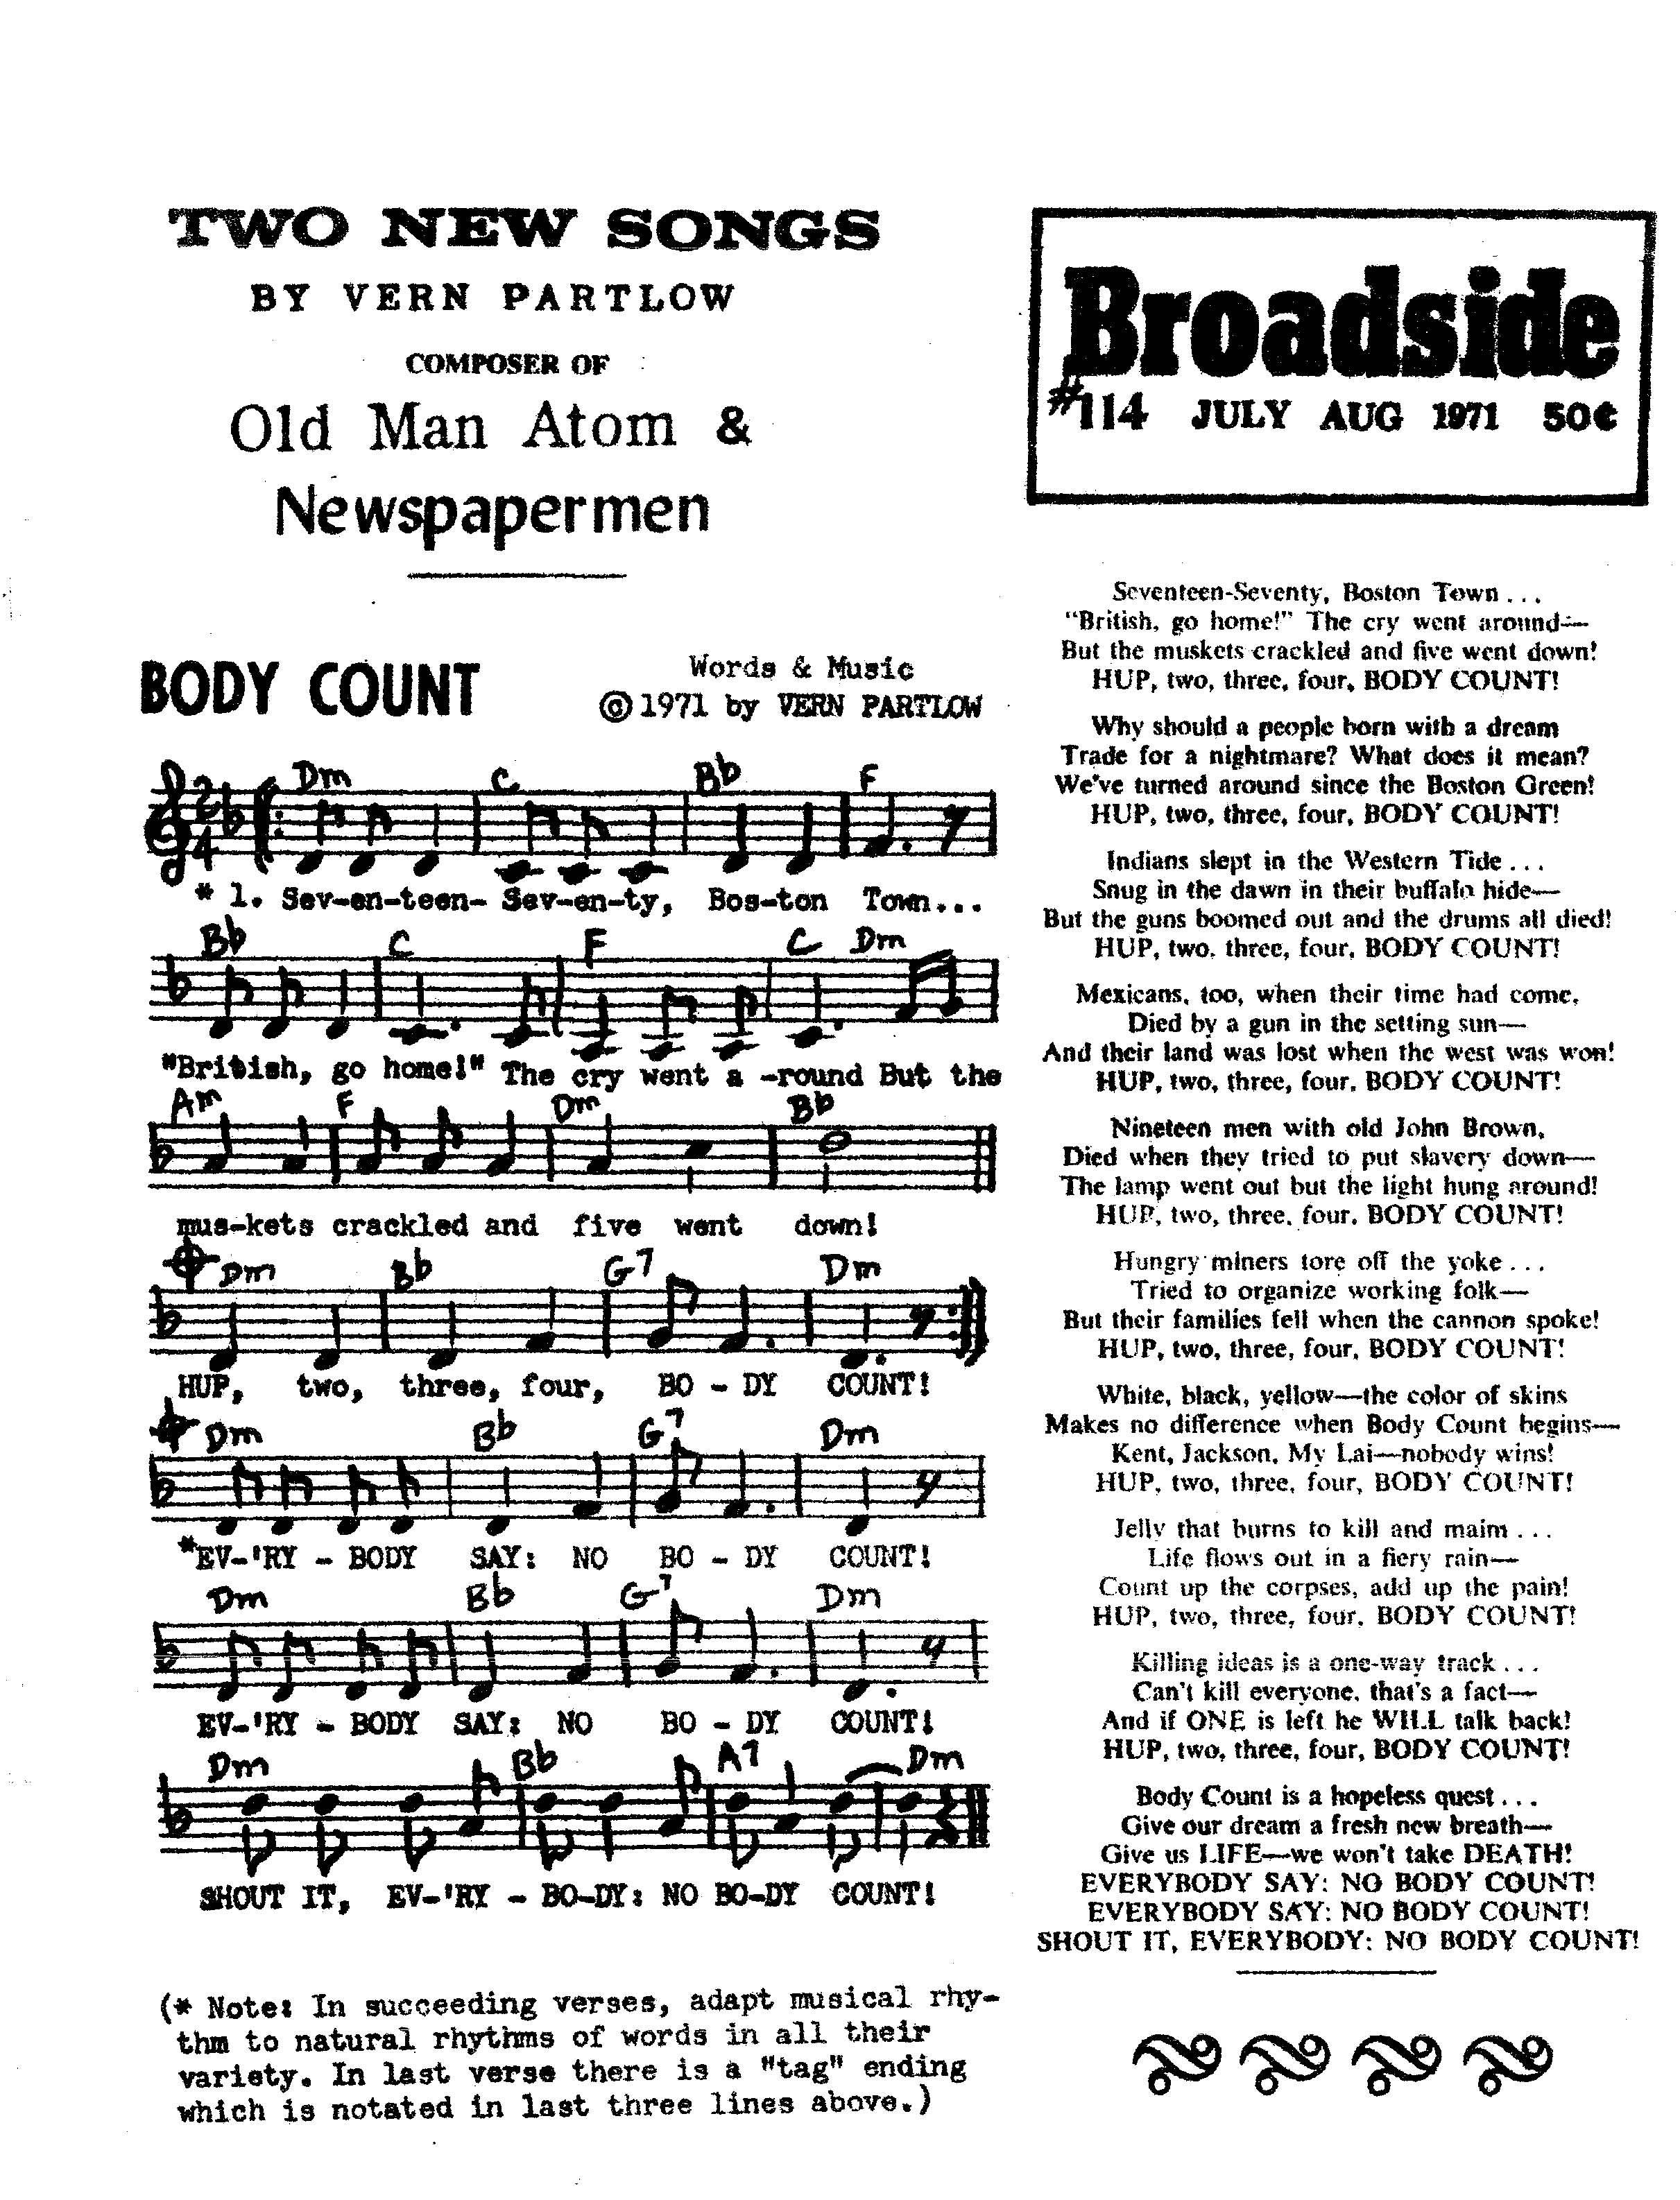 Broadside #114